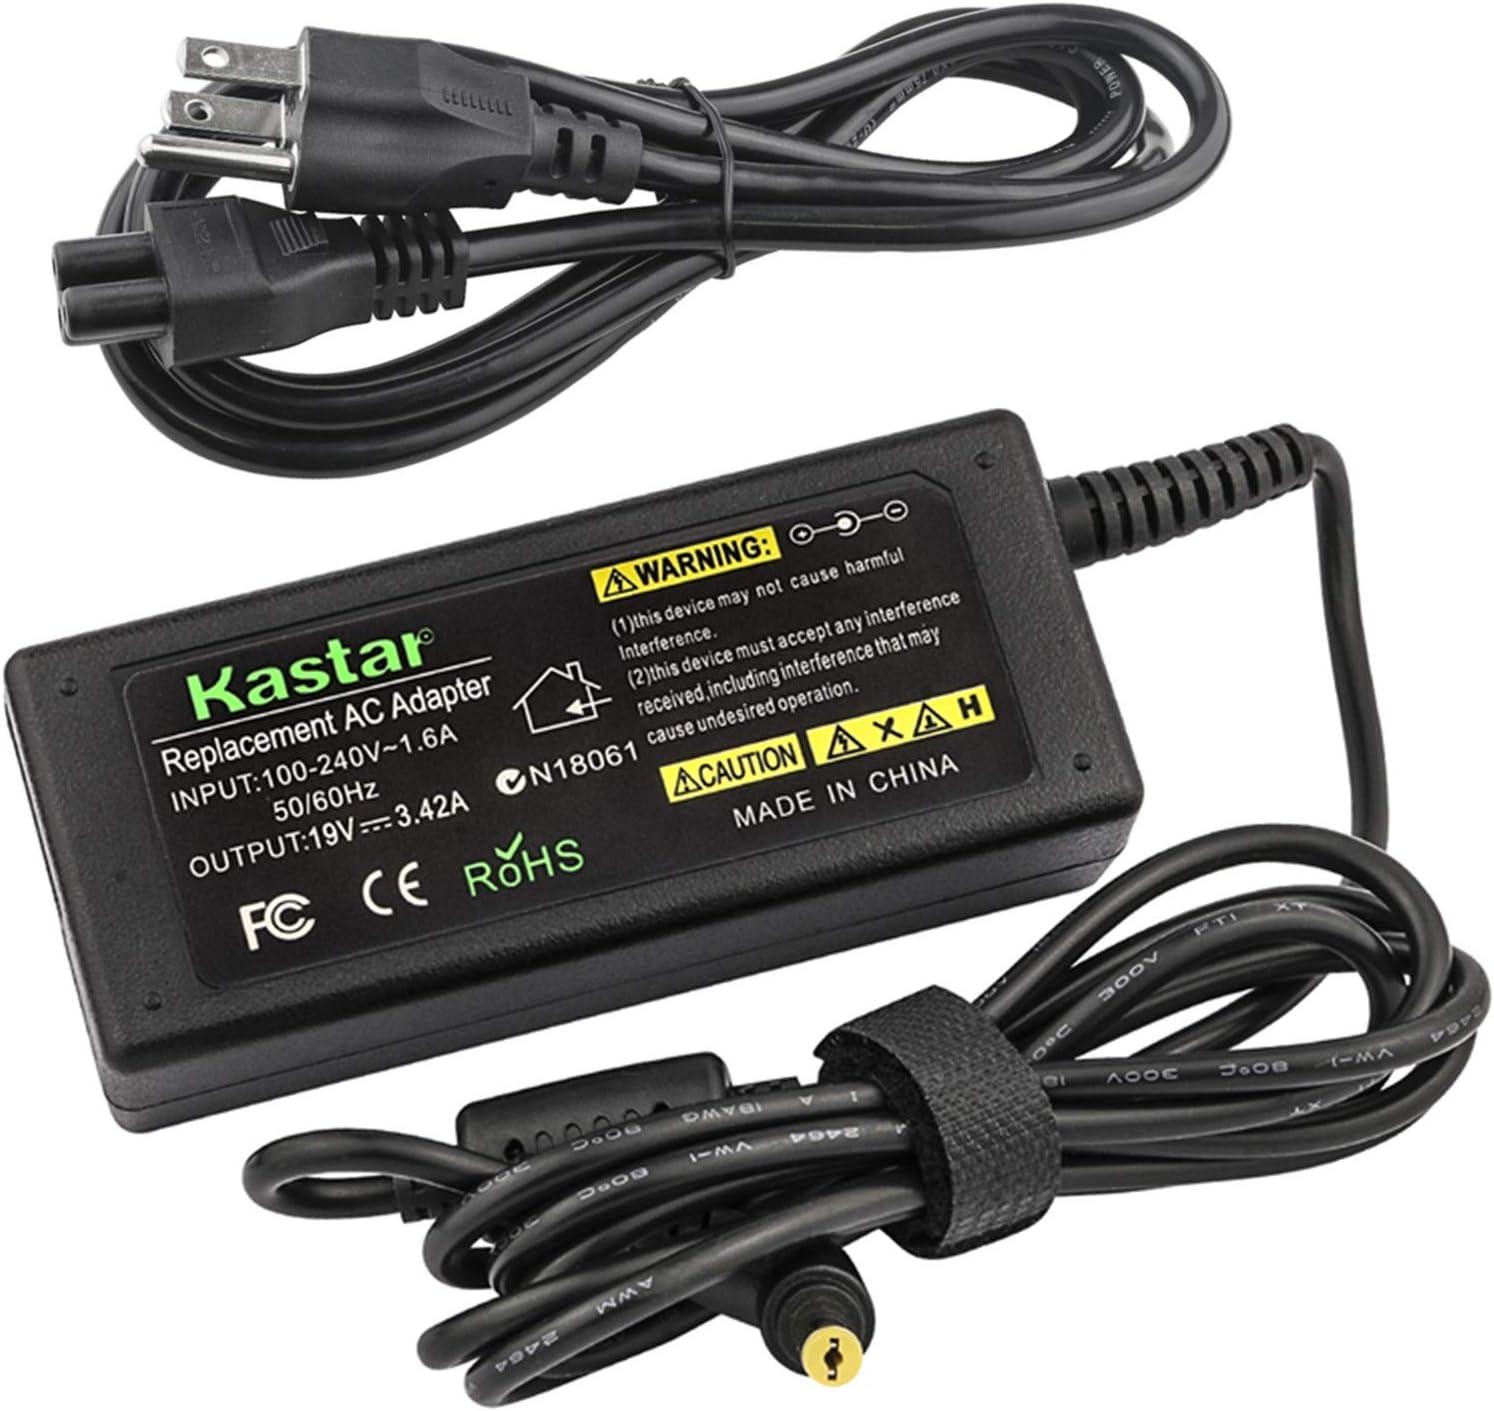 Kastar AC Adapter / Power Supply Replacement For Gateway Ne56r31u Ne56r34u Nv55c35u Nv55c38u Ne56r11u Ne56r12u Nv75s Nv75s02u Nv59c63u Nv59c65u Ne56r16u Ne56r27u Nv52l15u Nv56r10u Nv55s15u Nv57h20u